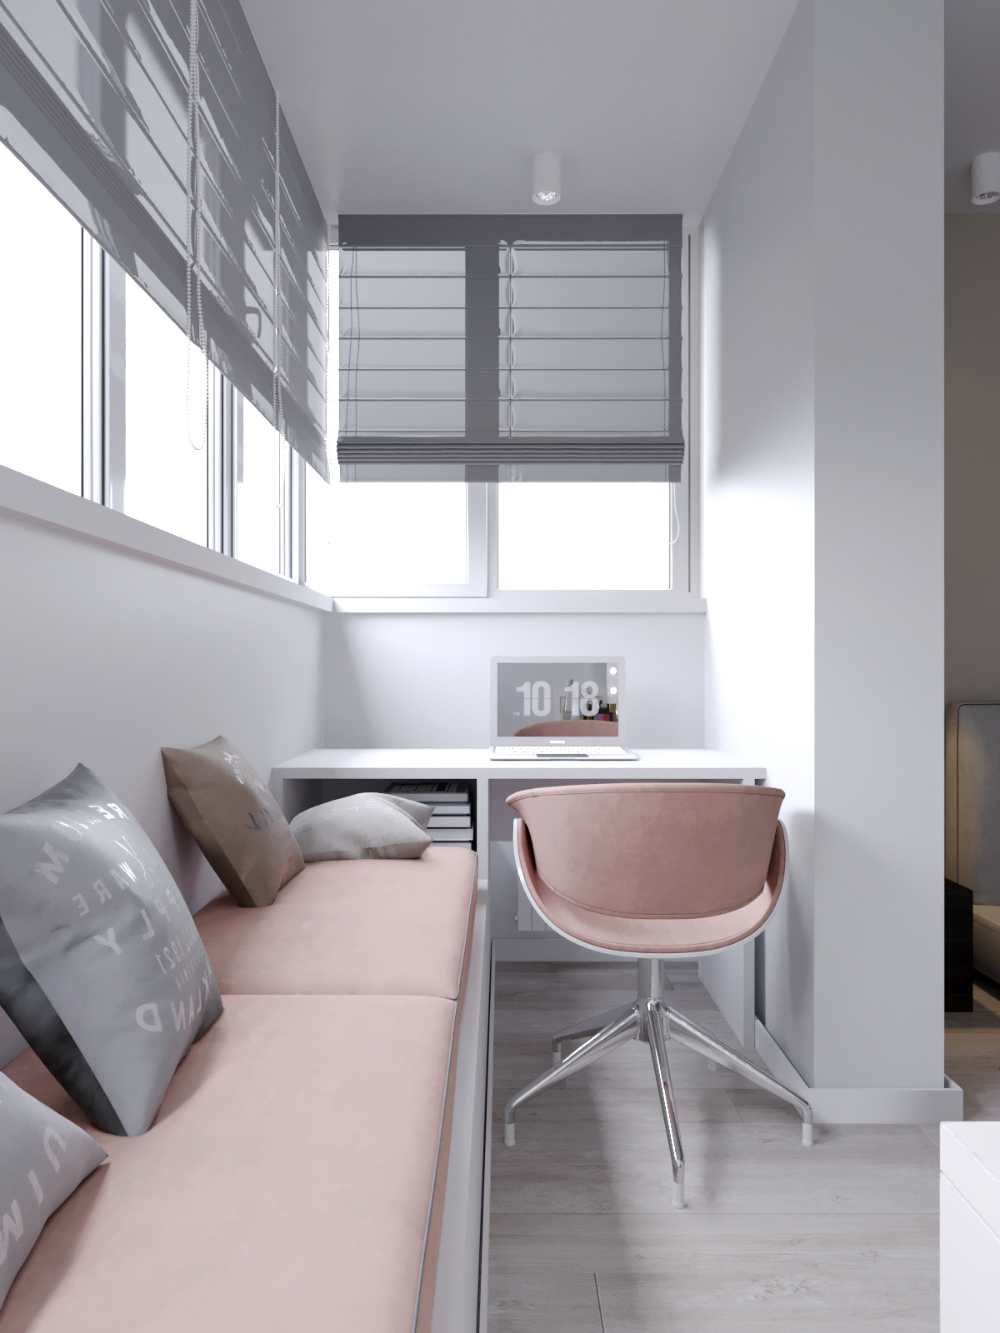 Autodesk Room Design: Room In Minimalizm On Behance